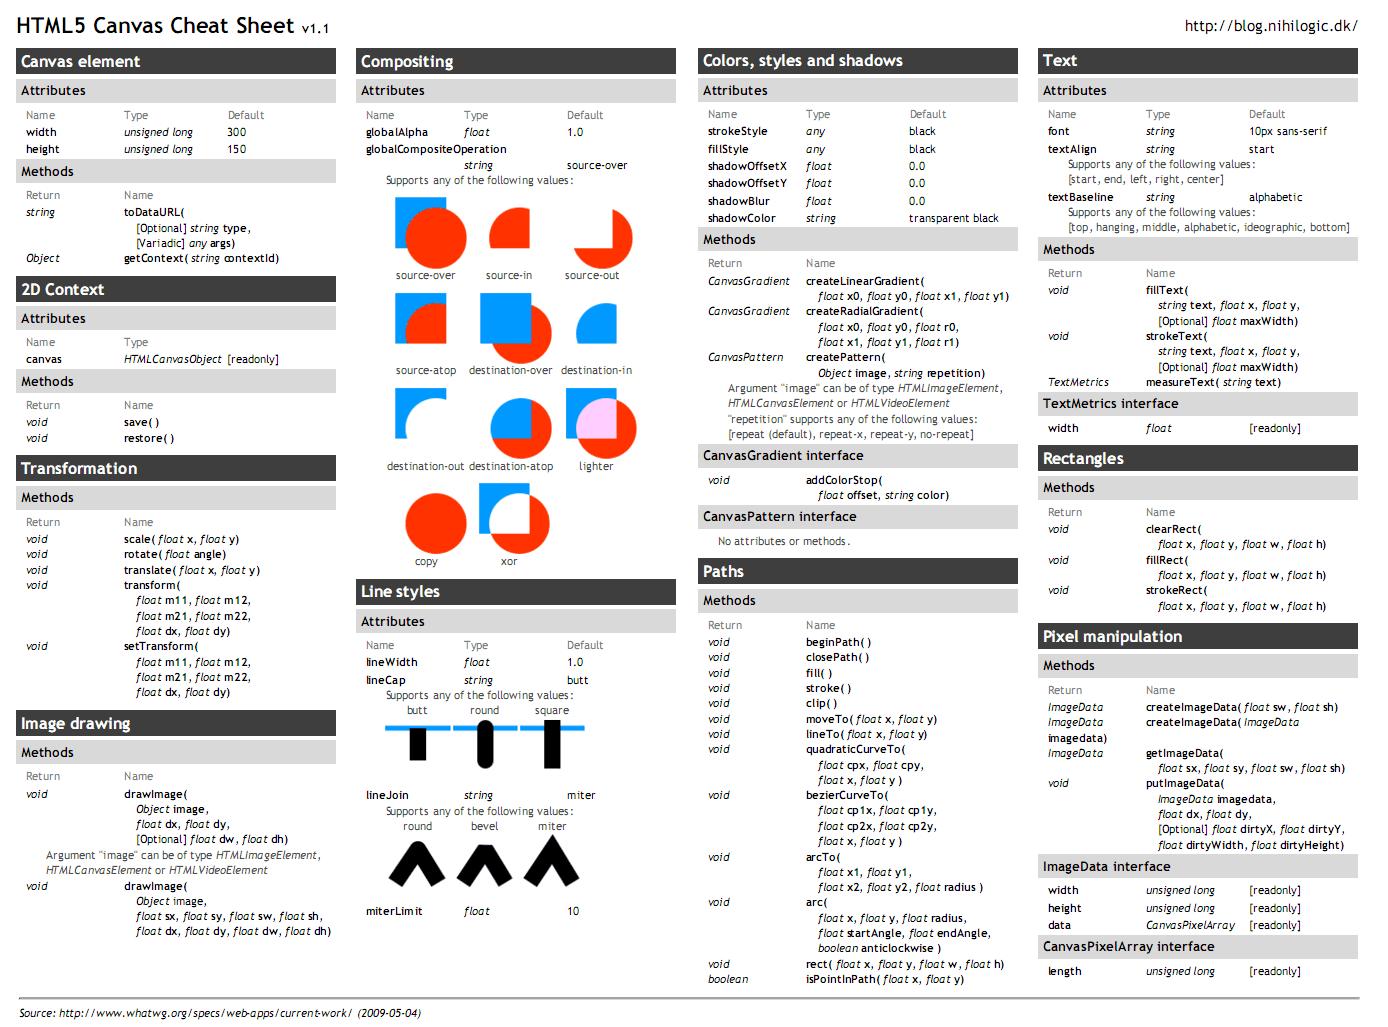 canvas sheet API